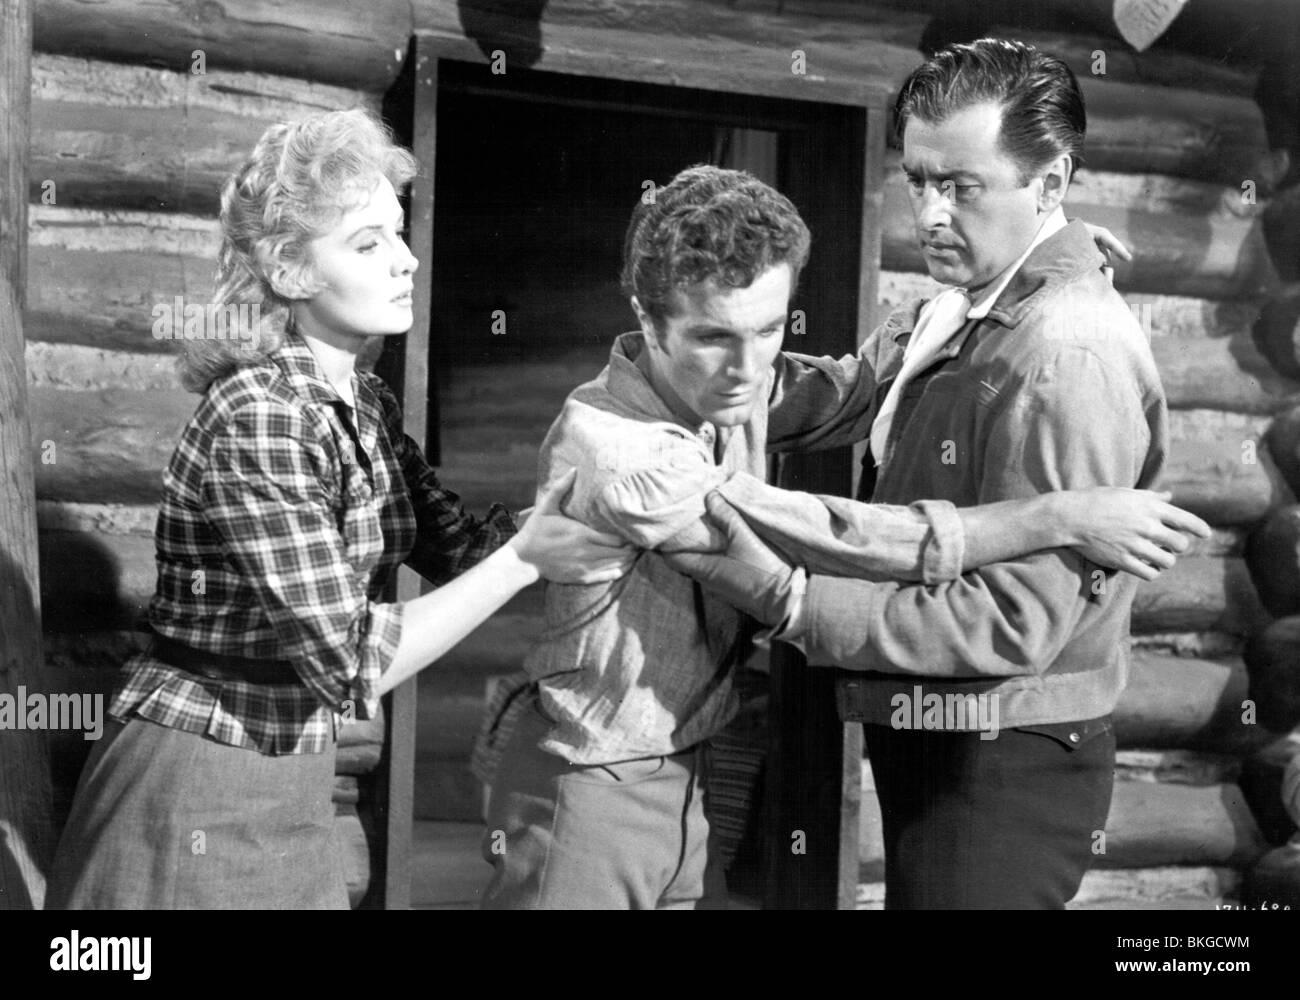 GUN GLORY (1957) RHONDA FLEMING GLY 001-01 - Stock Image